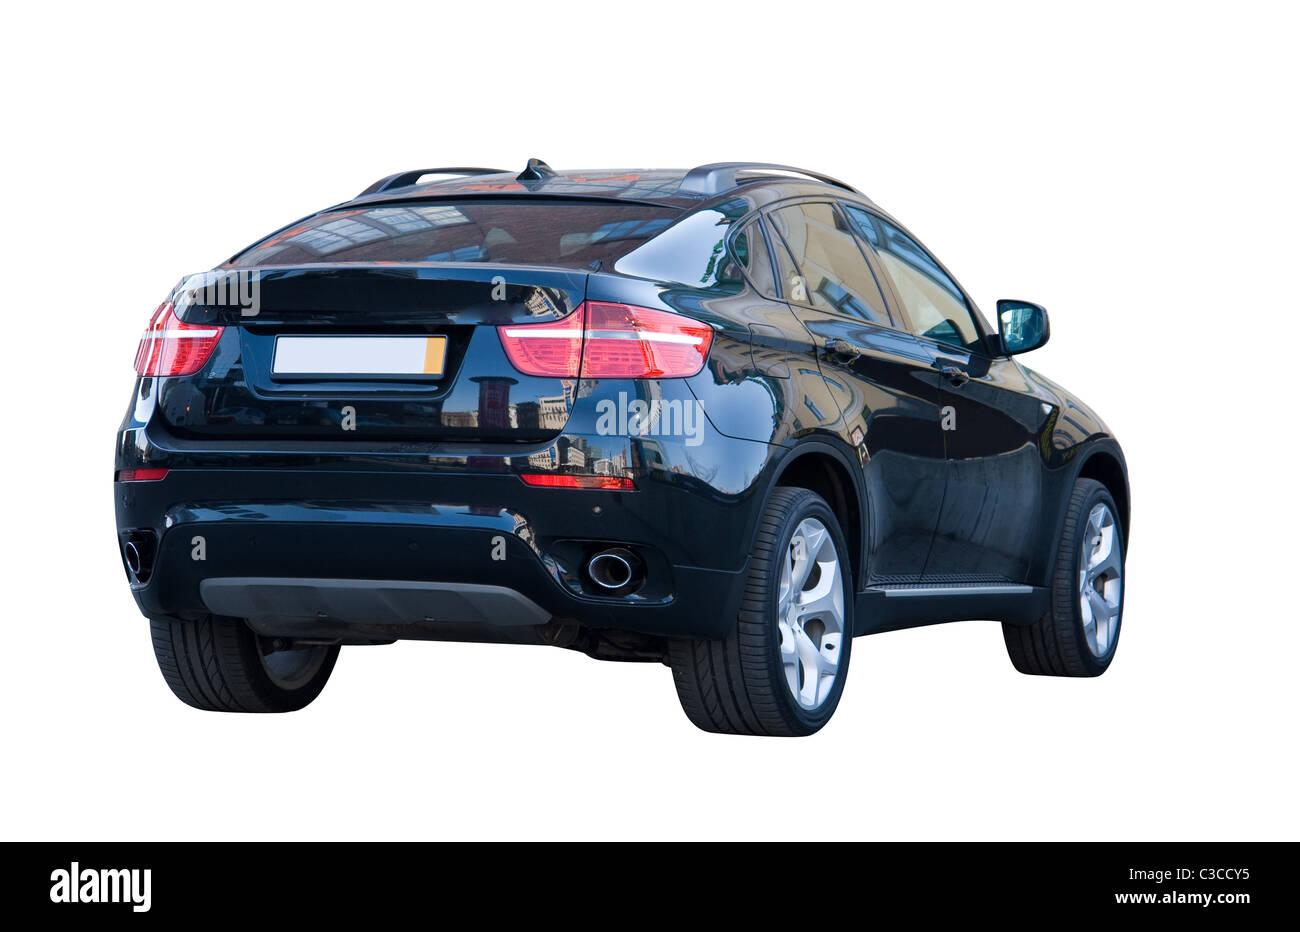 Modern Black Off Road Car - over White - Stock Image